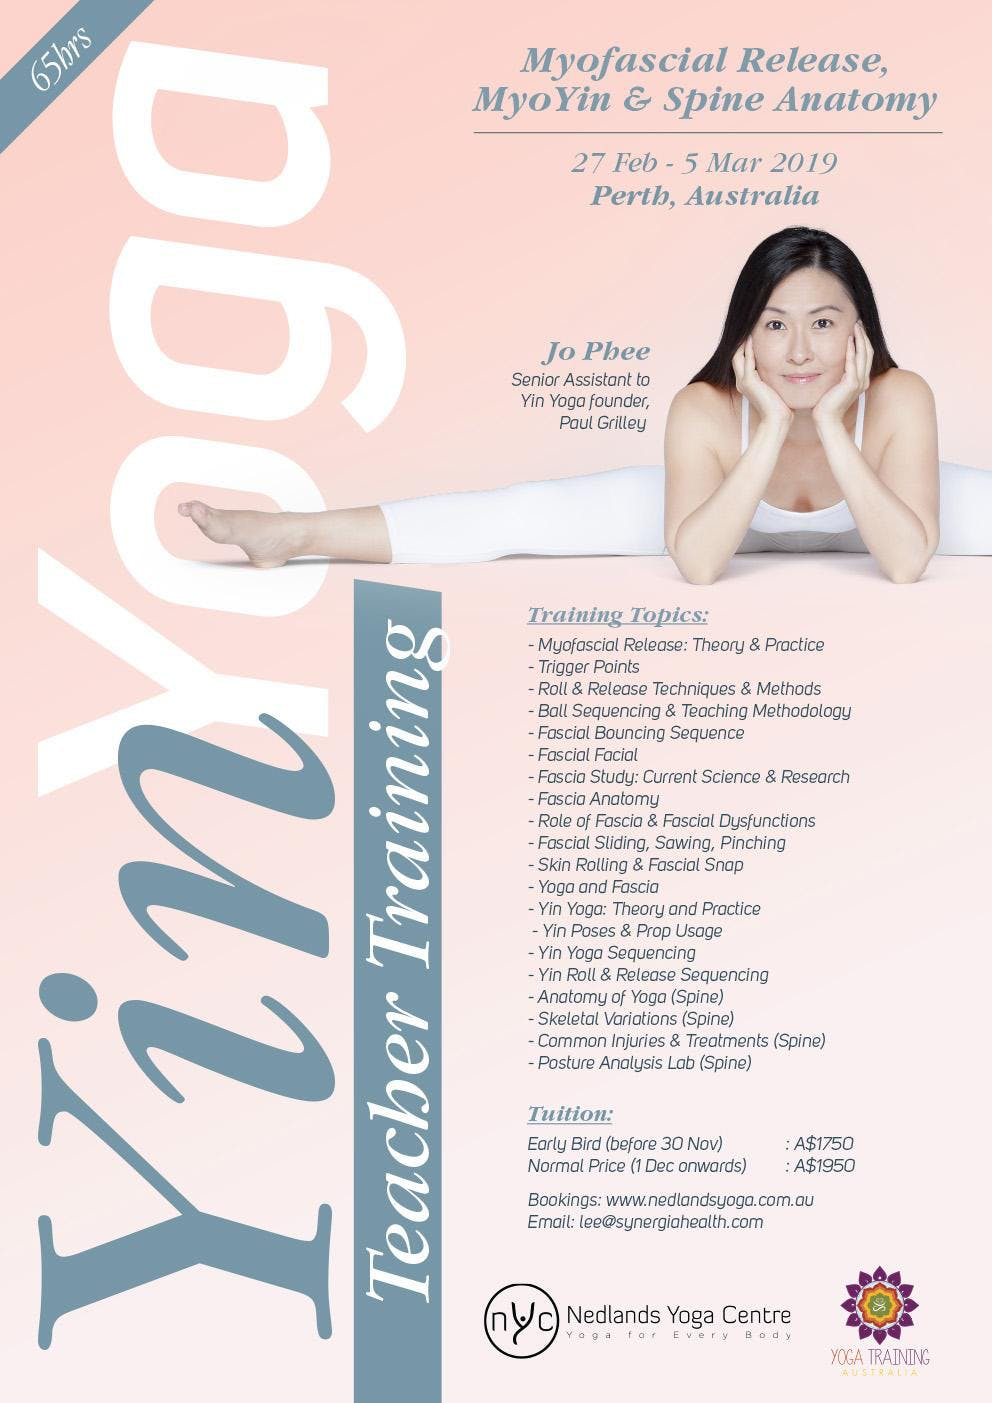 Jo Phee Yin Yoga & Myofascial Release Perth 2019 at Nedlands Yoga ...